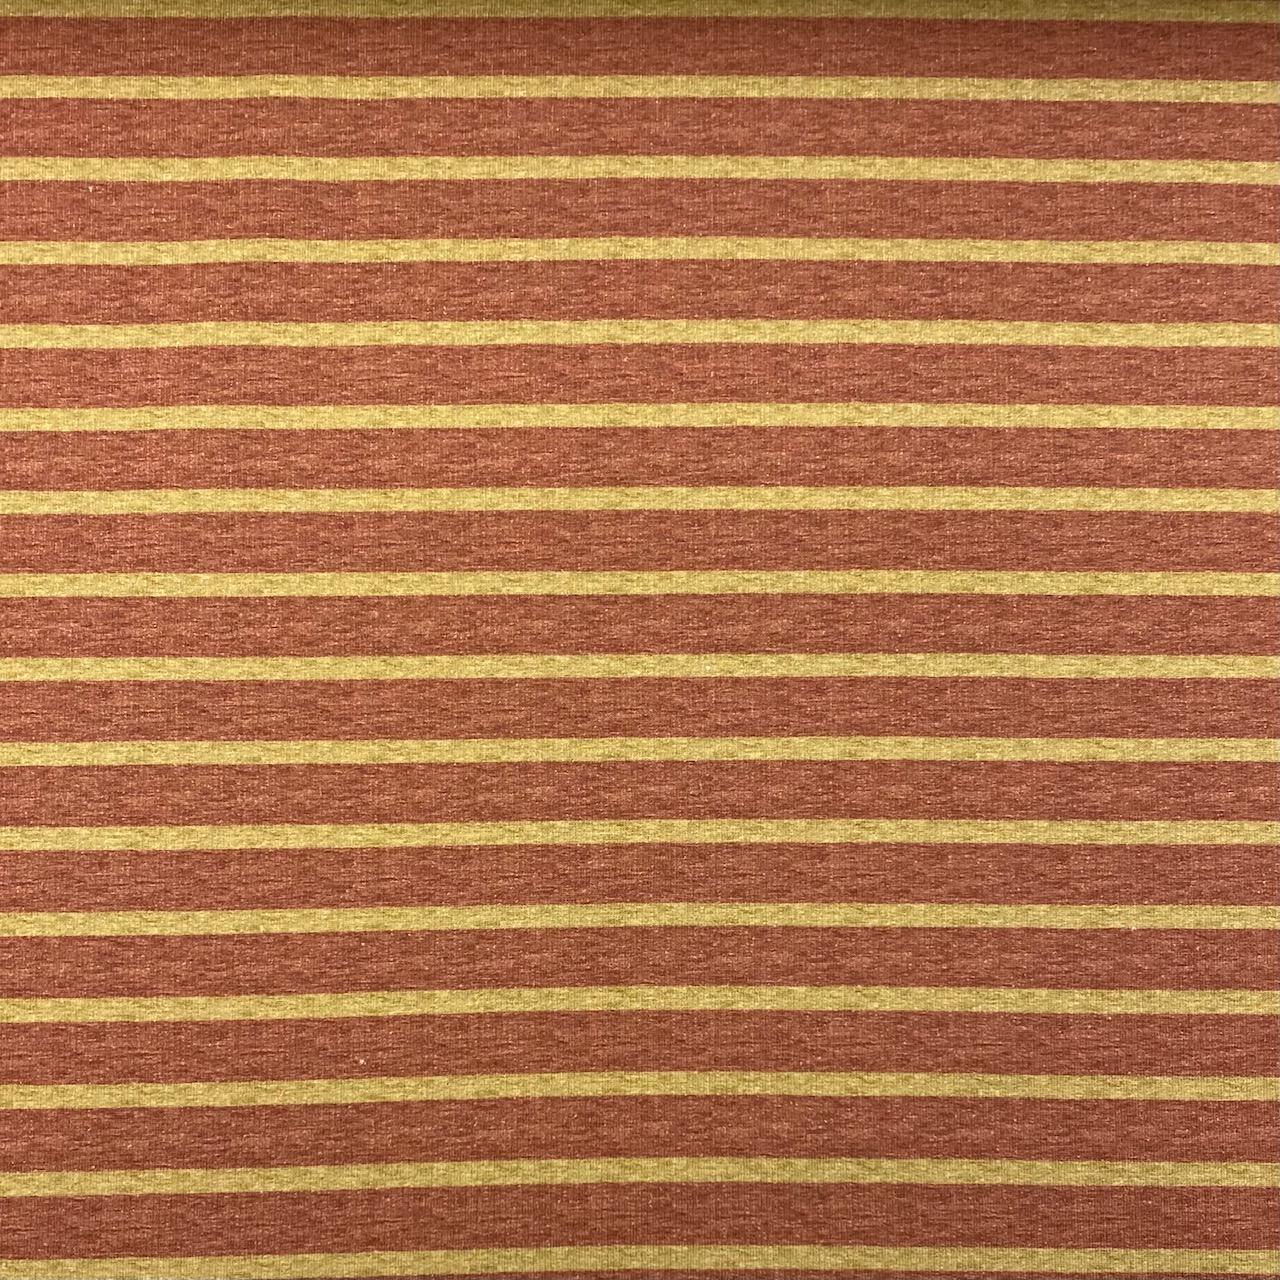 Sweat French Terry, angeraut, Streifen dunkelrosa/curry.  Art. 4982.1718